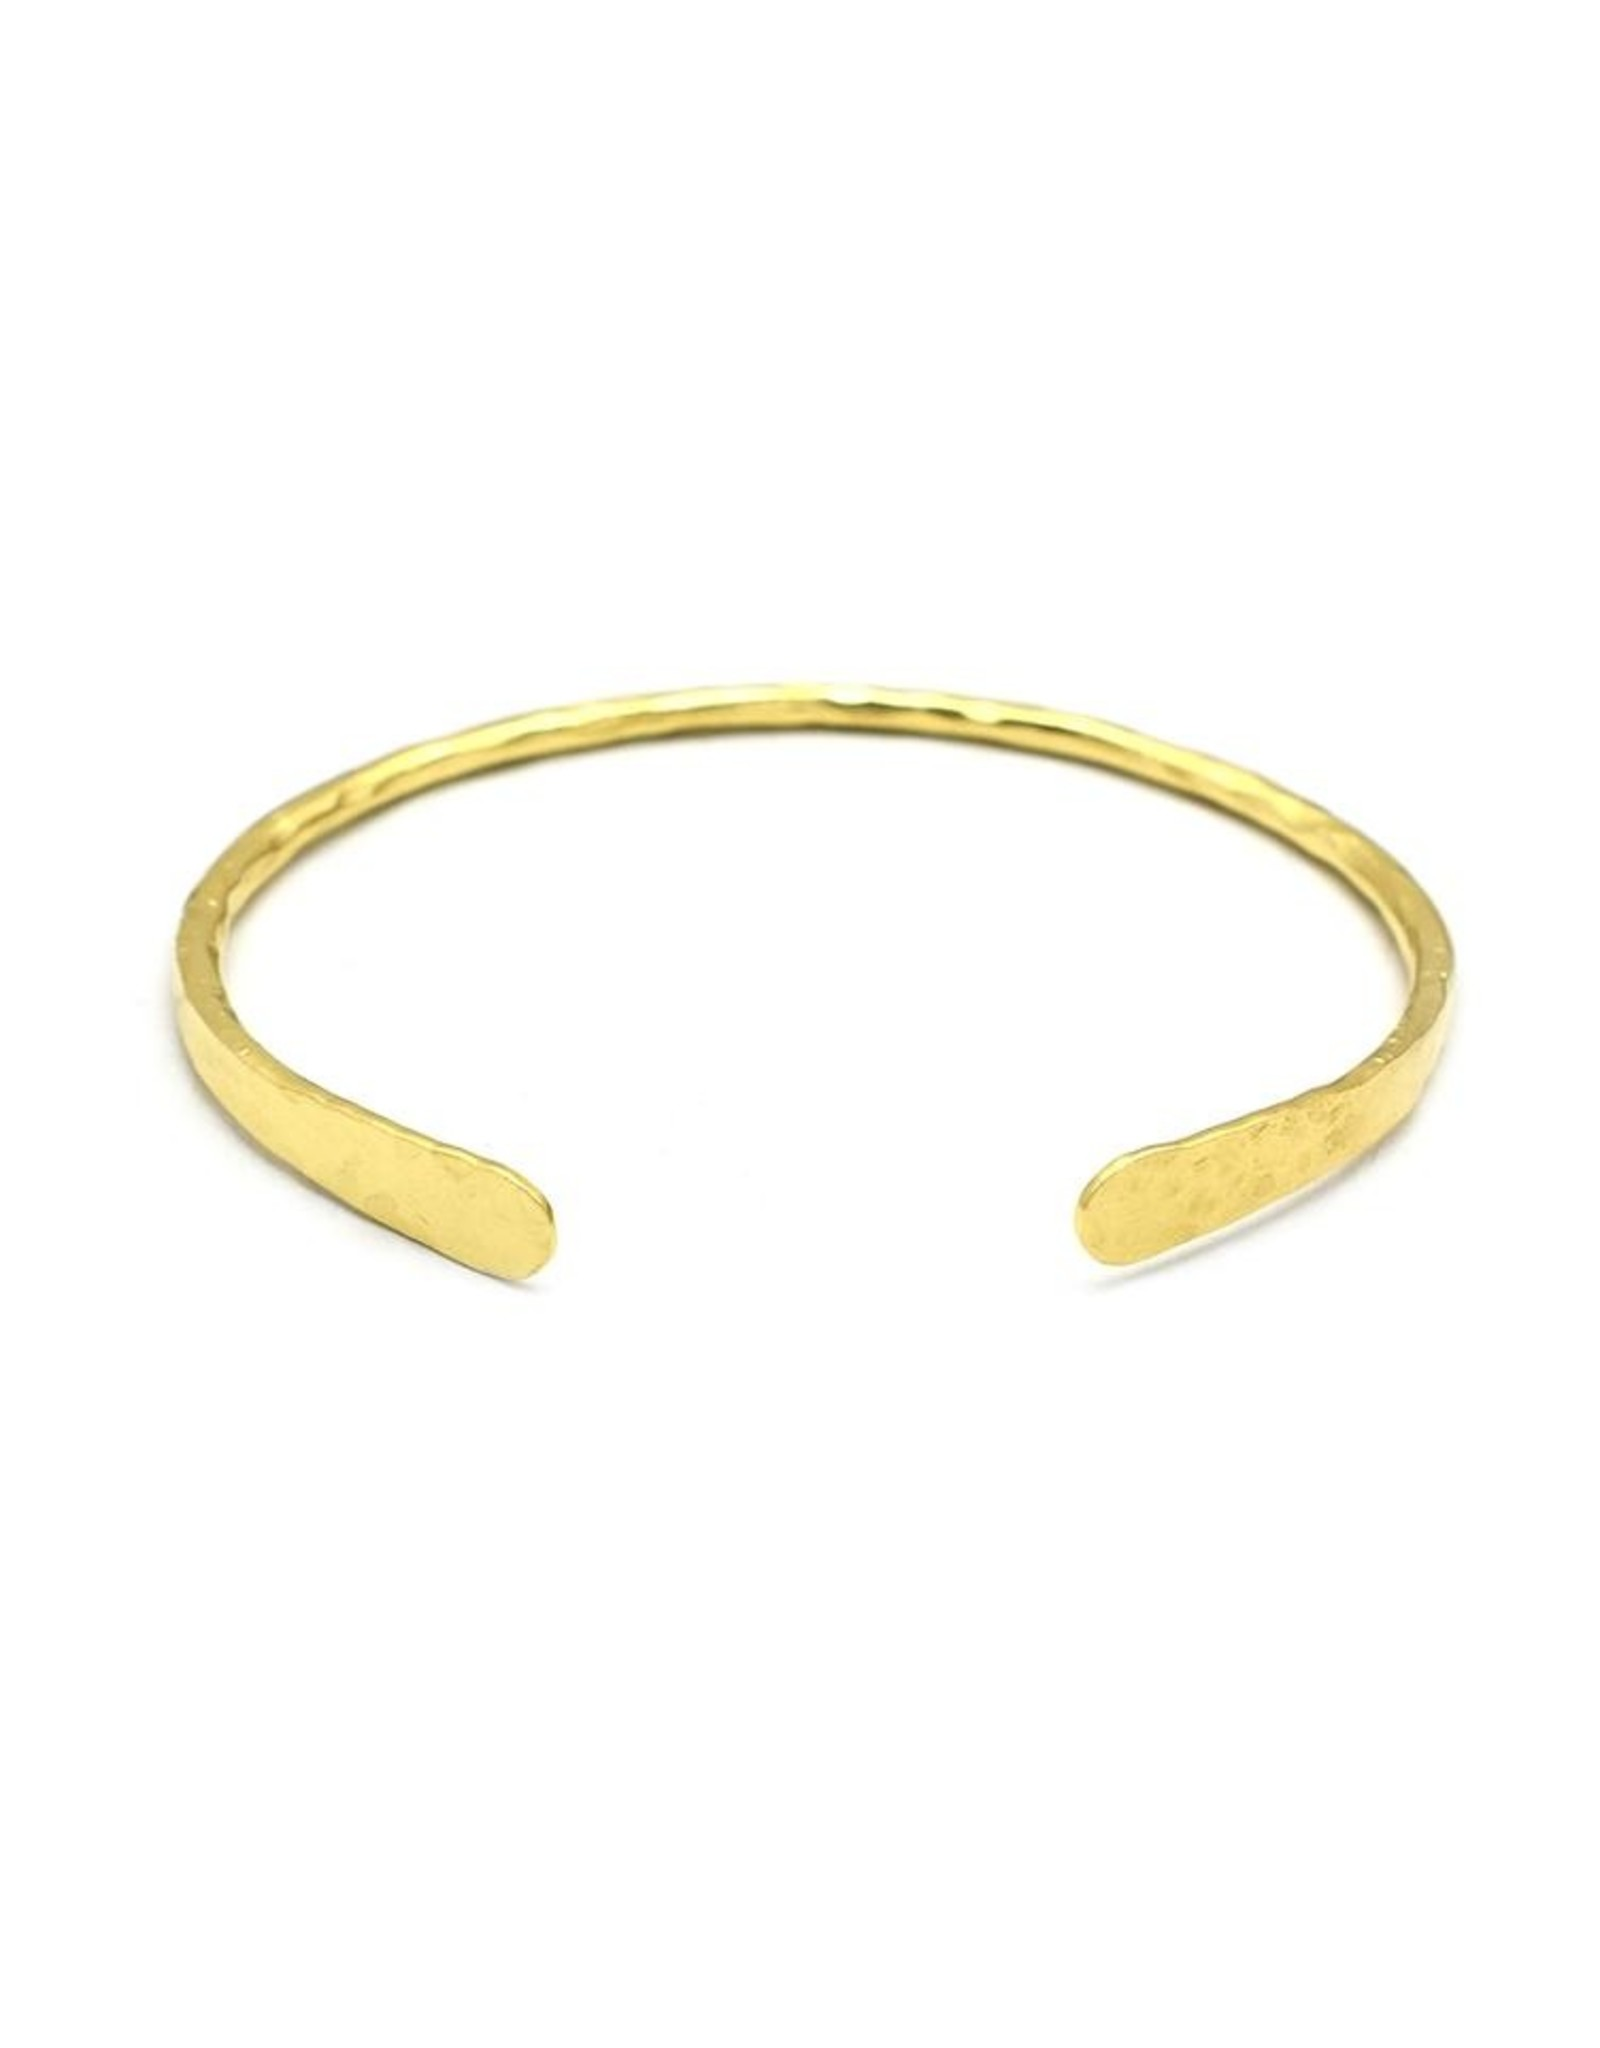 Armreif Hammeret Oval - Silber vergoldet